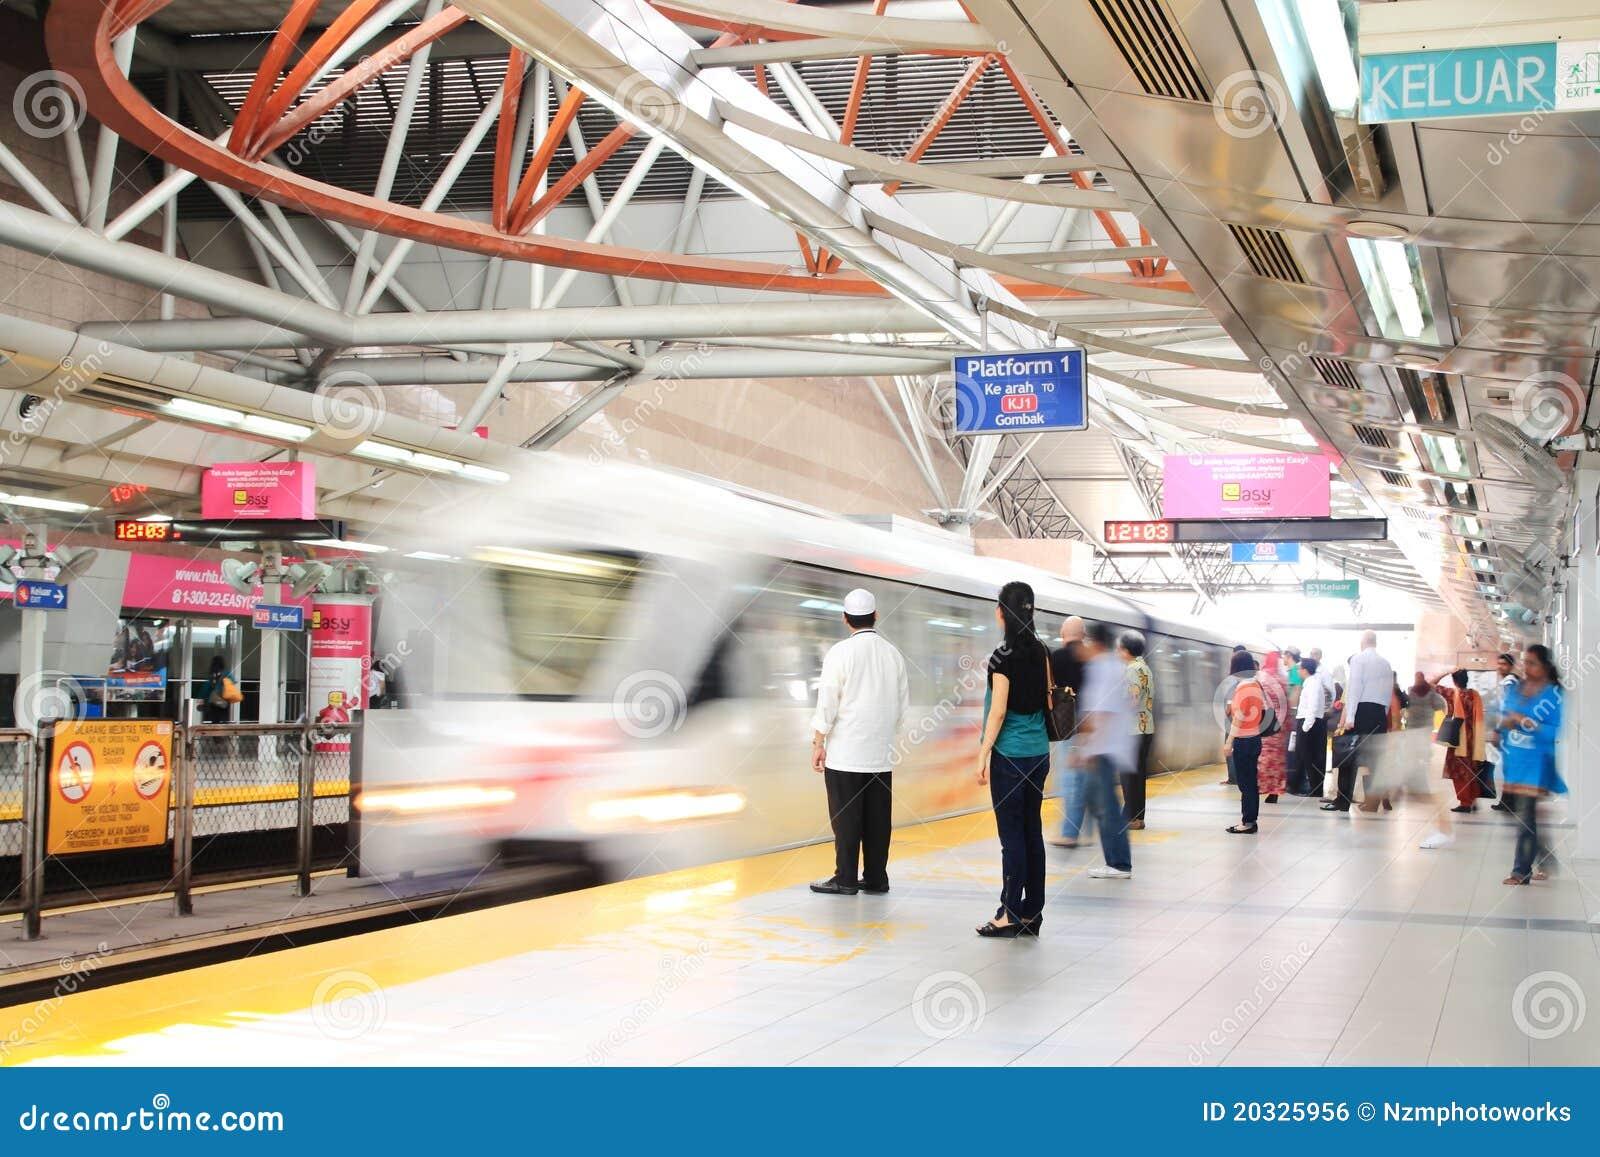 Kuala Lumpur Sentral Train Station